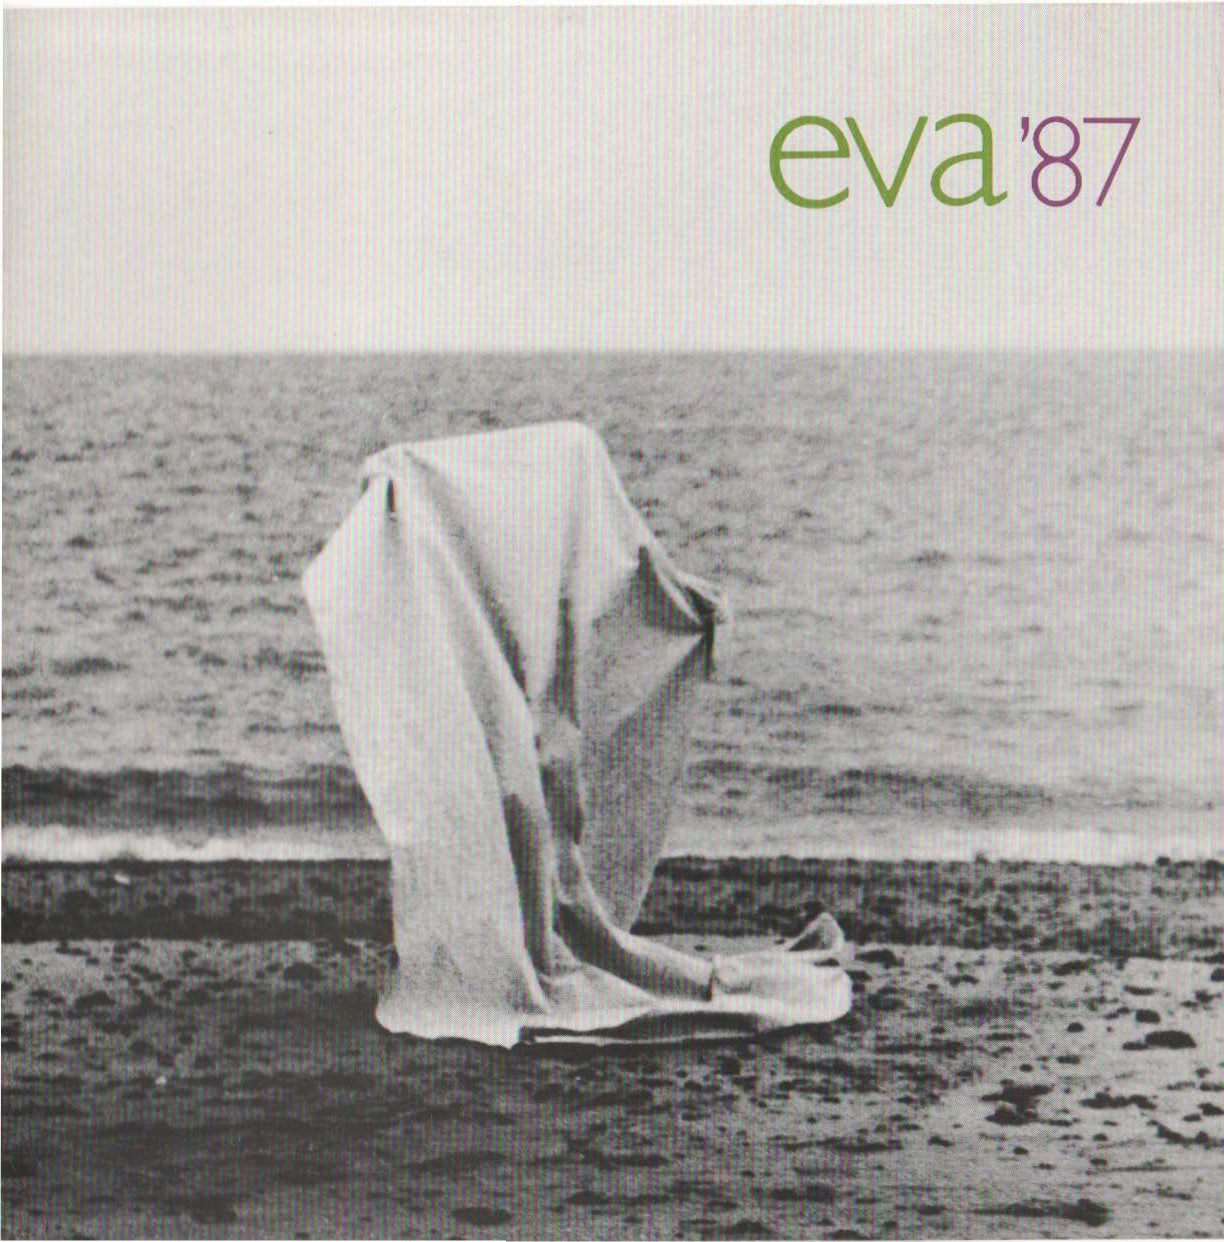 EVA '87 Exhibition Catalogue